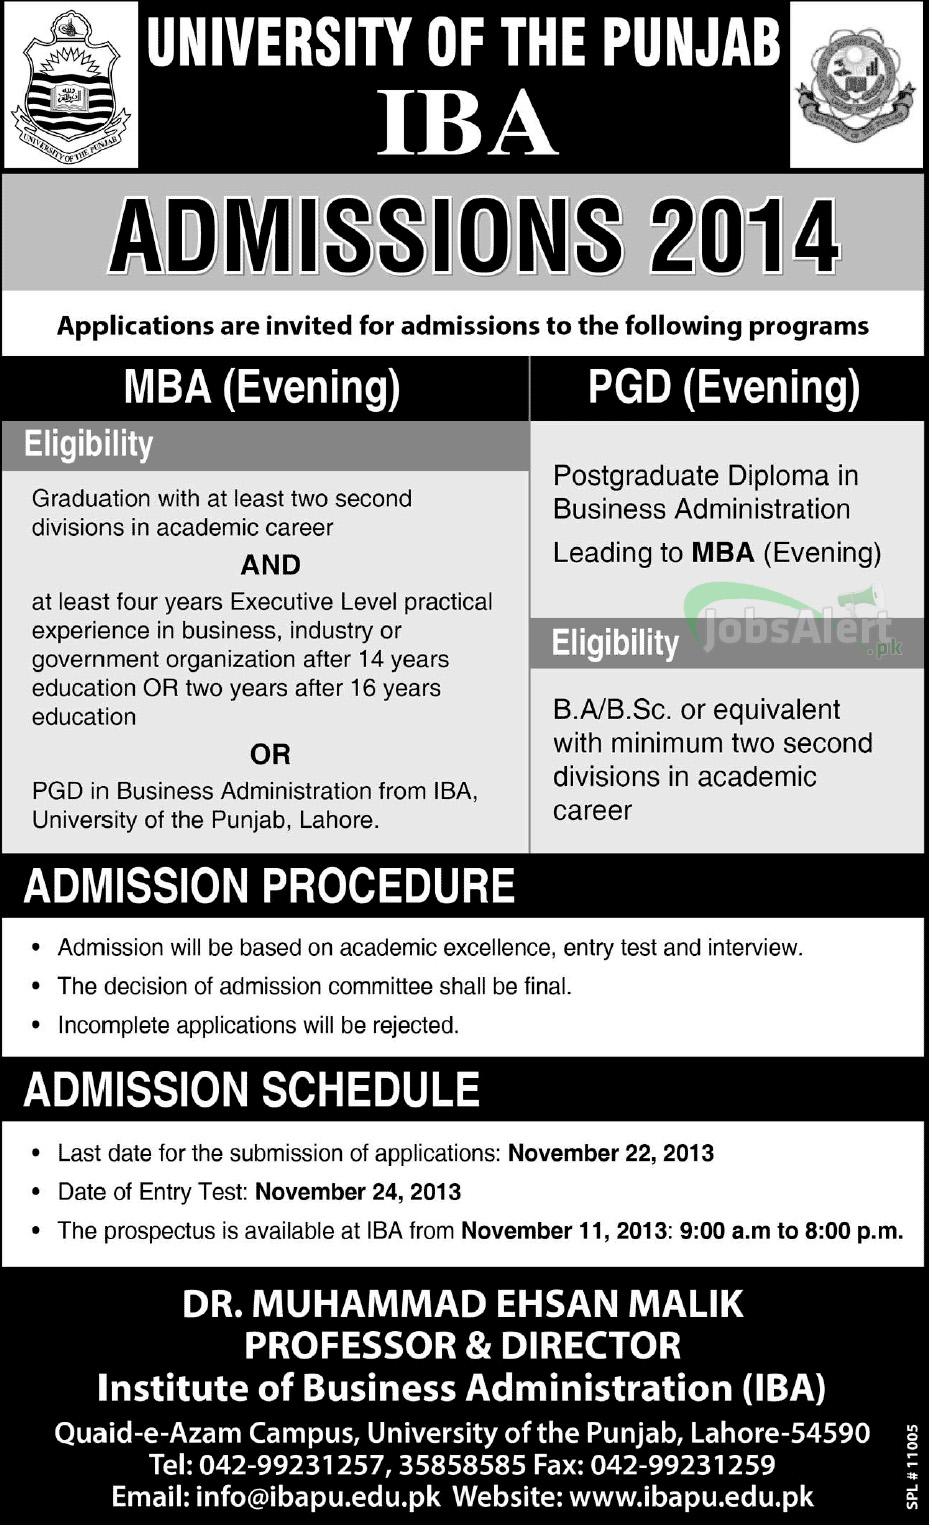 IBA University Of The Punjab MBA Admissions 2014